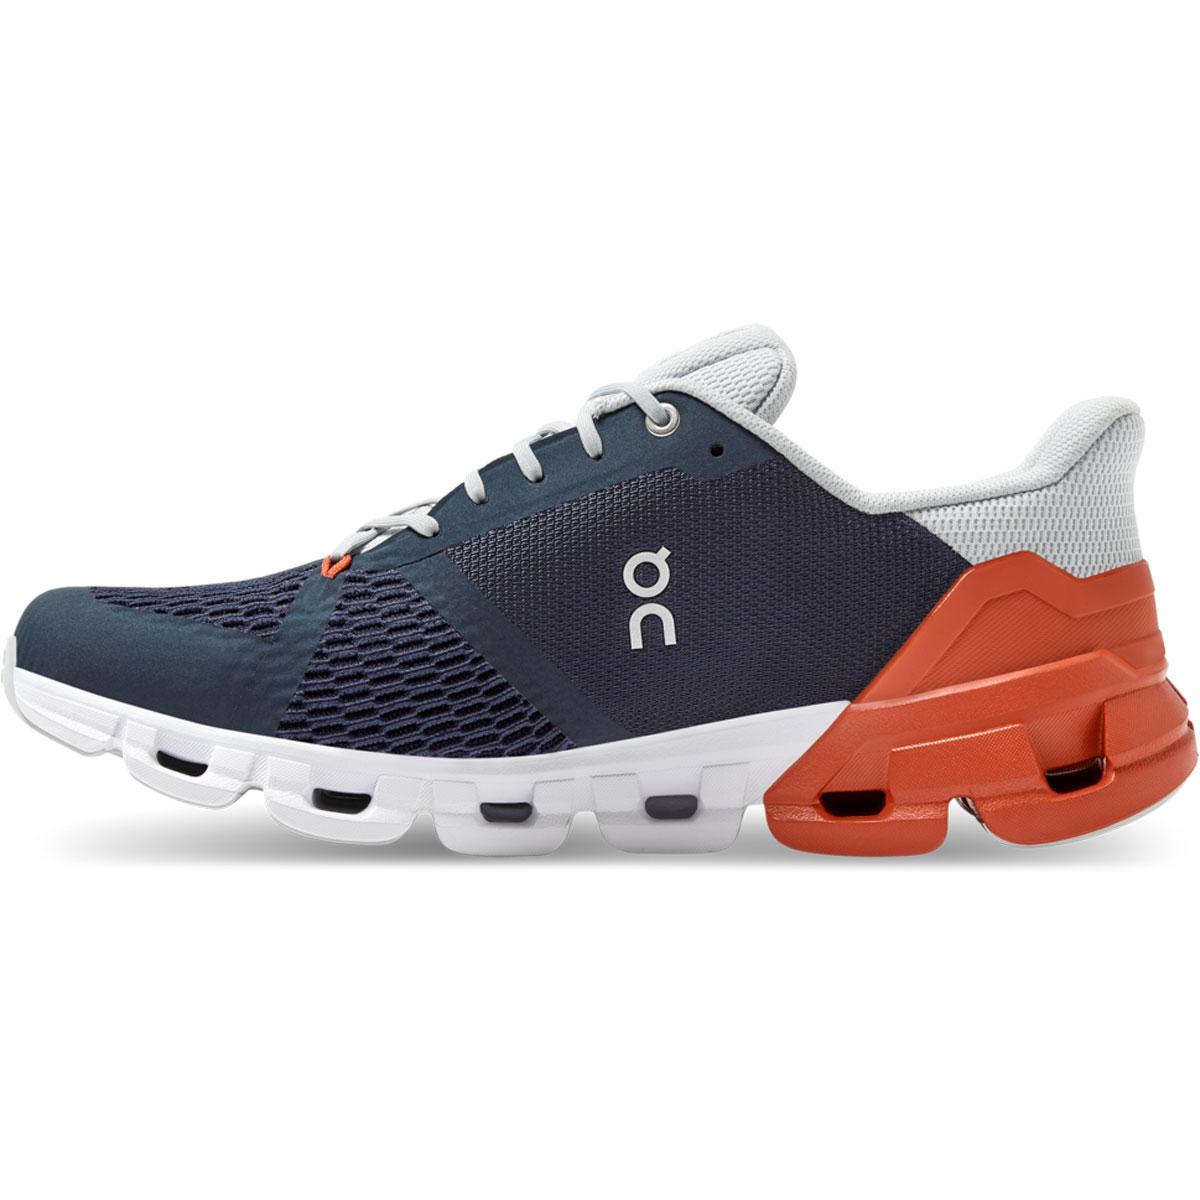 Men's On Cloudflyer 2.0 Running Shoe - Color: Midnight/Rust - Size: 7 - Width: Regular, Midnight/Rust, large, image 2